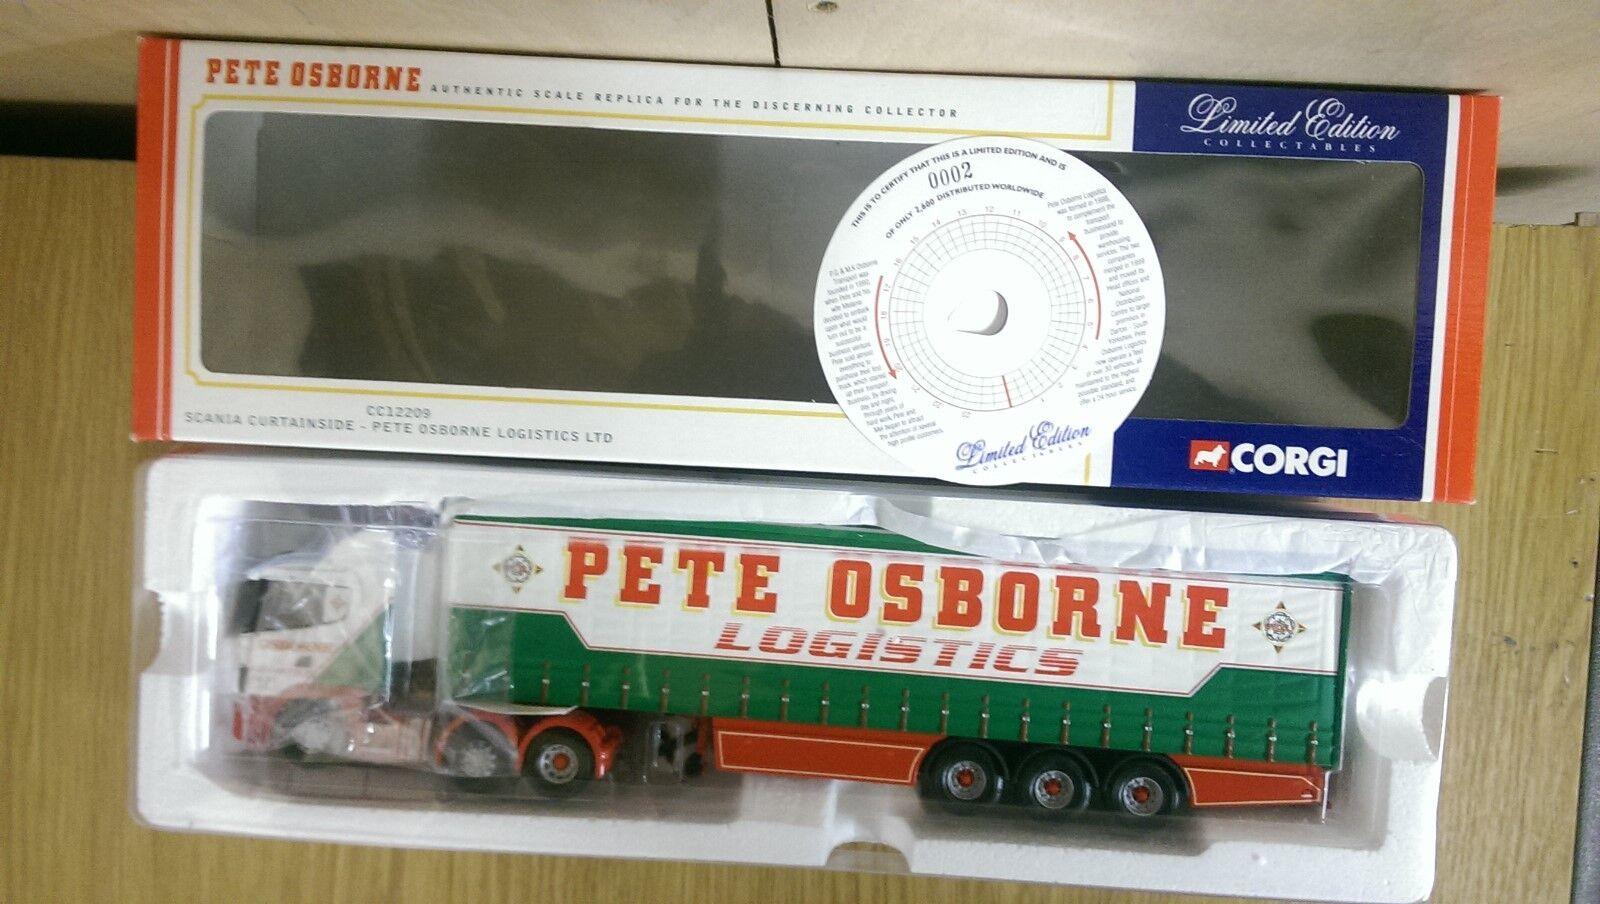 Corgi CC12209 Scania Curtainside Pete Osborne Logistics Ltd Ed No. 0002 of 2600